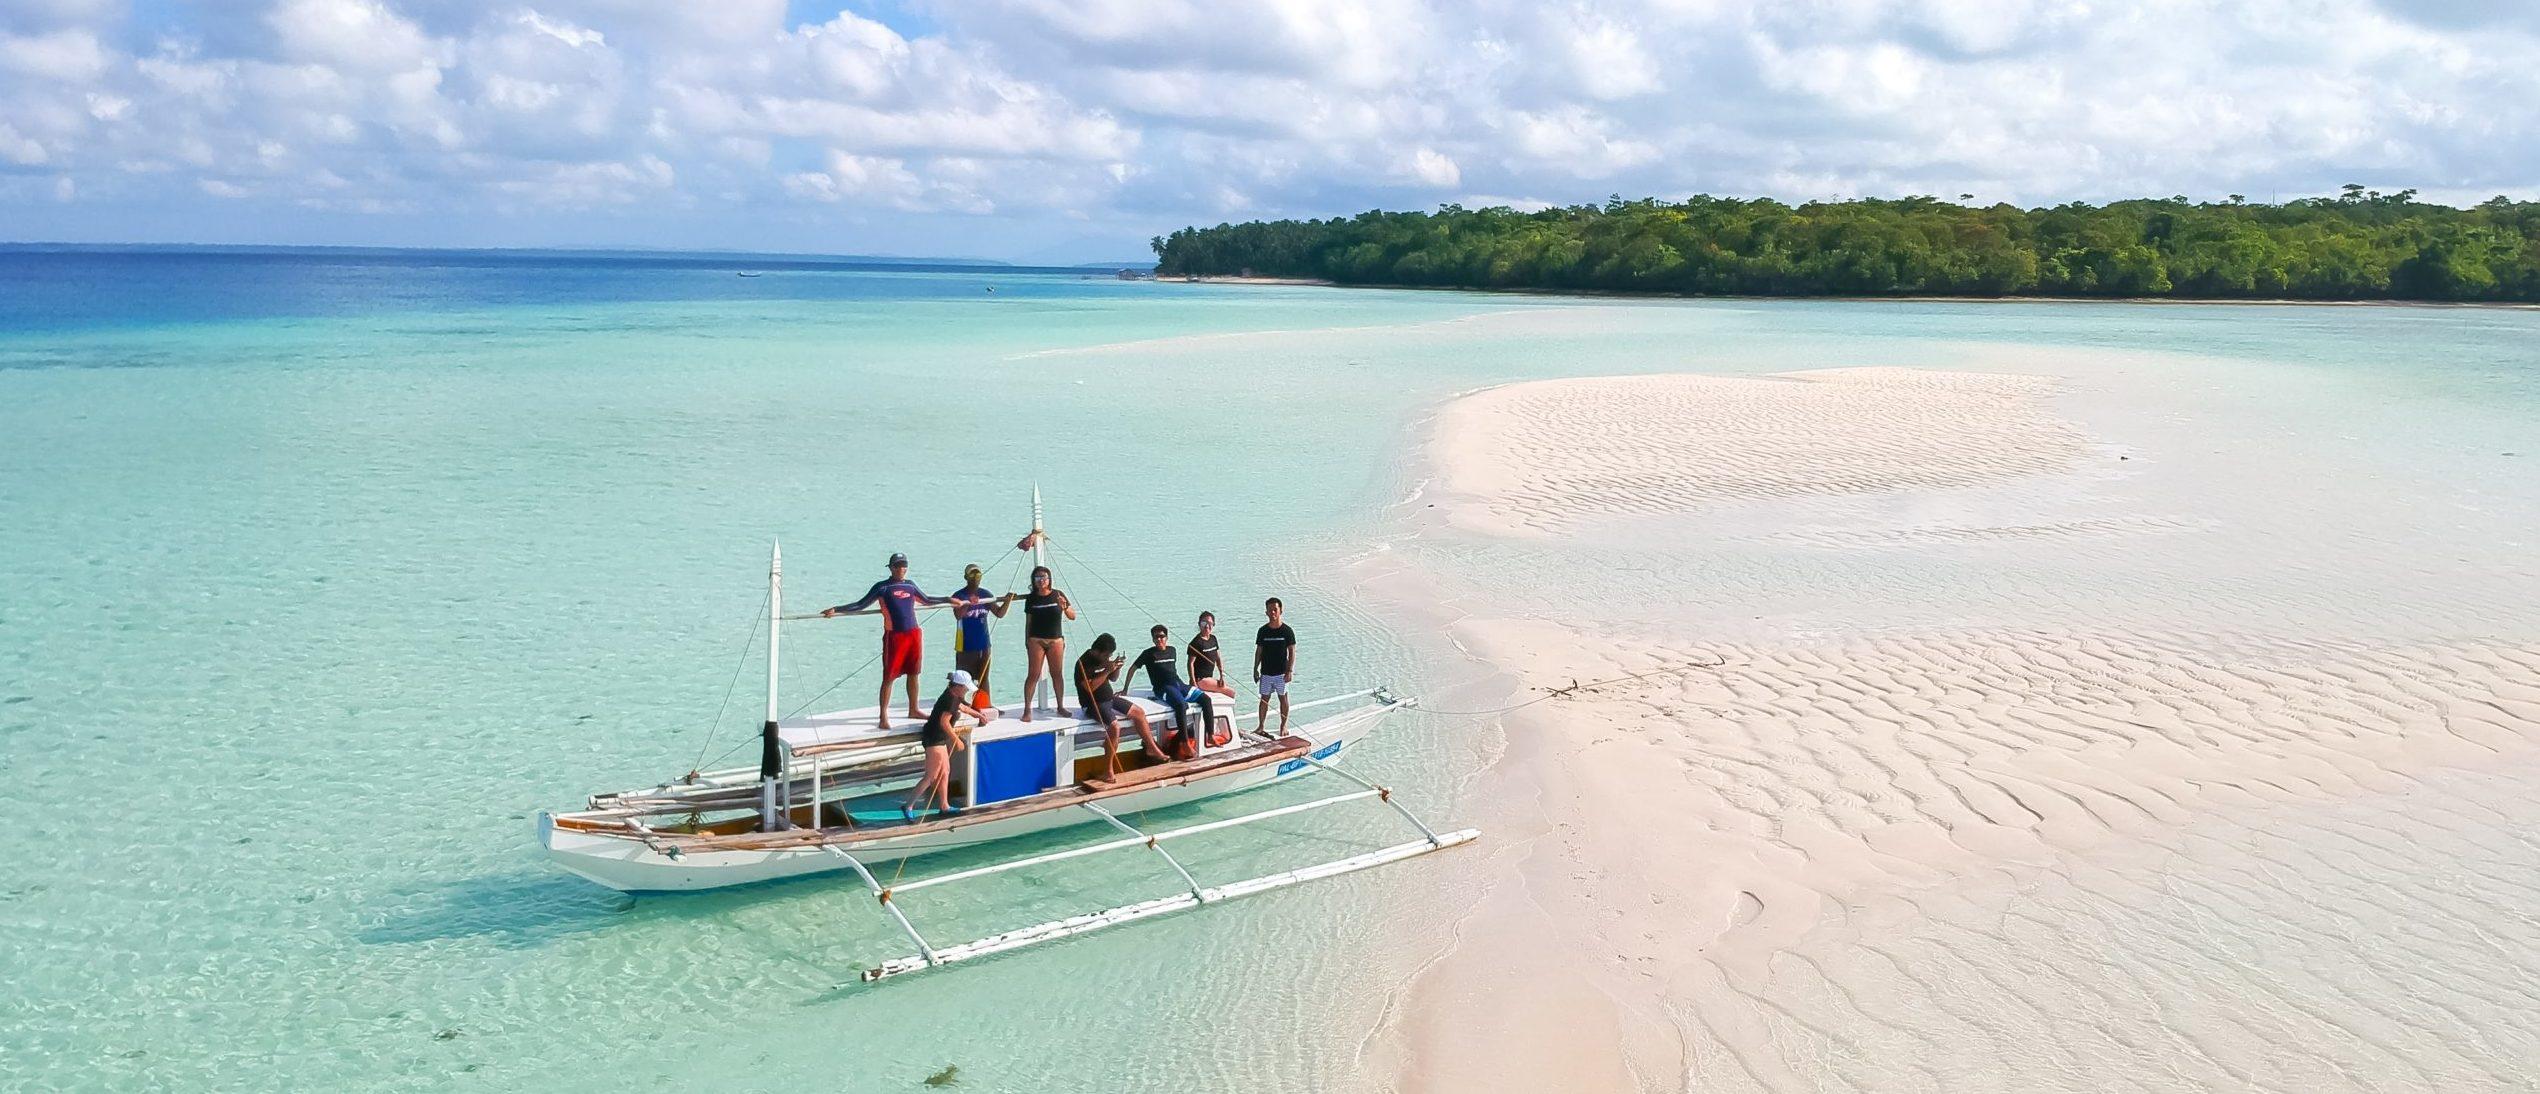 travel experiences hotelier academy